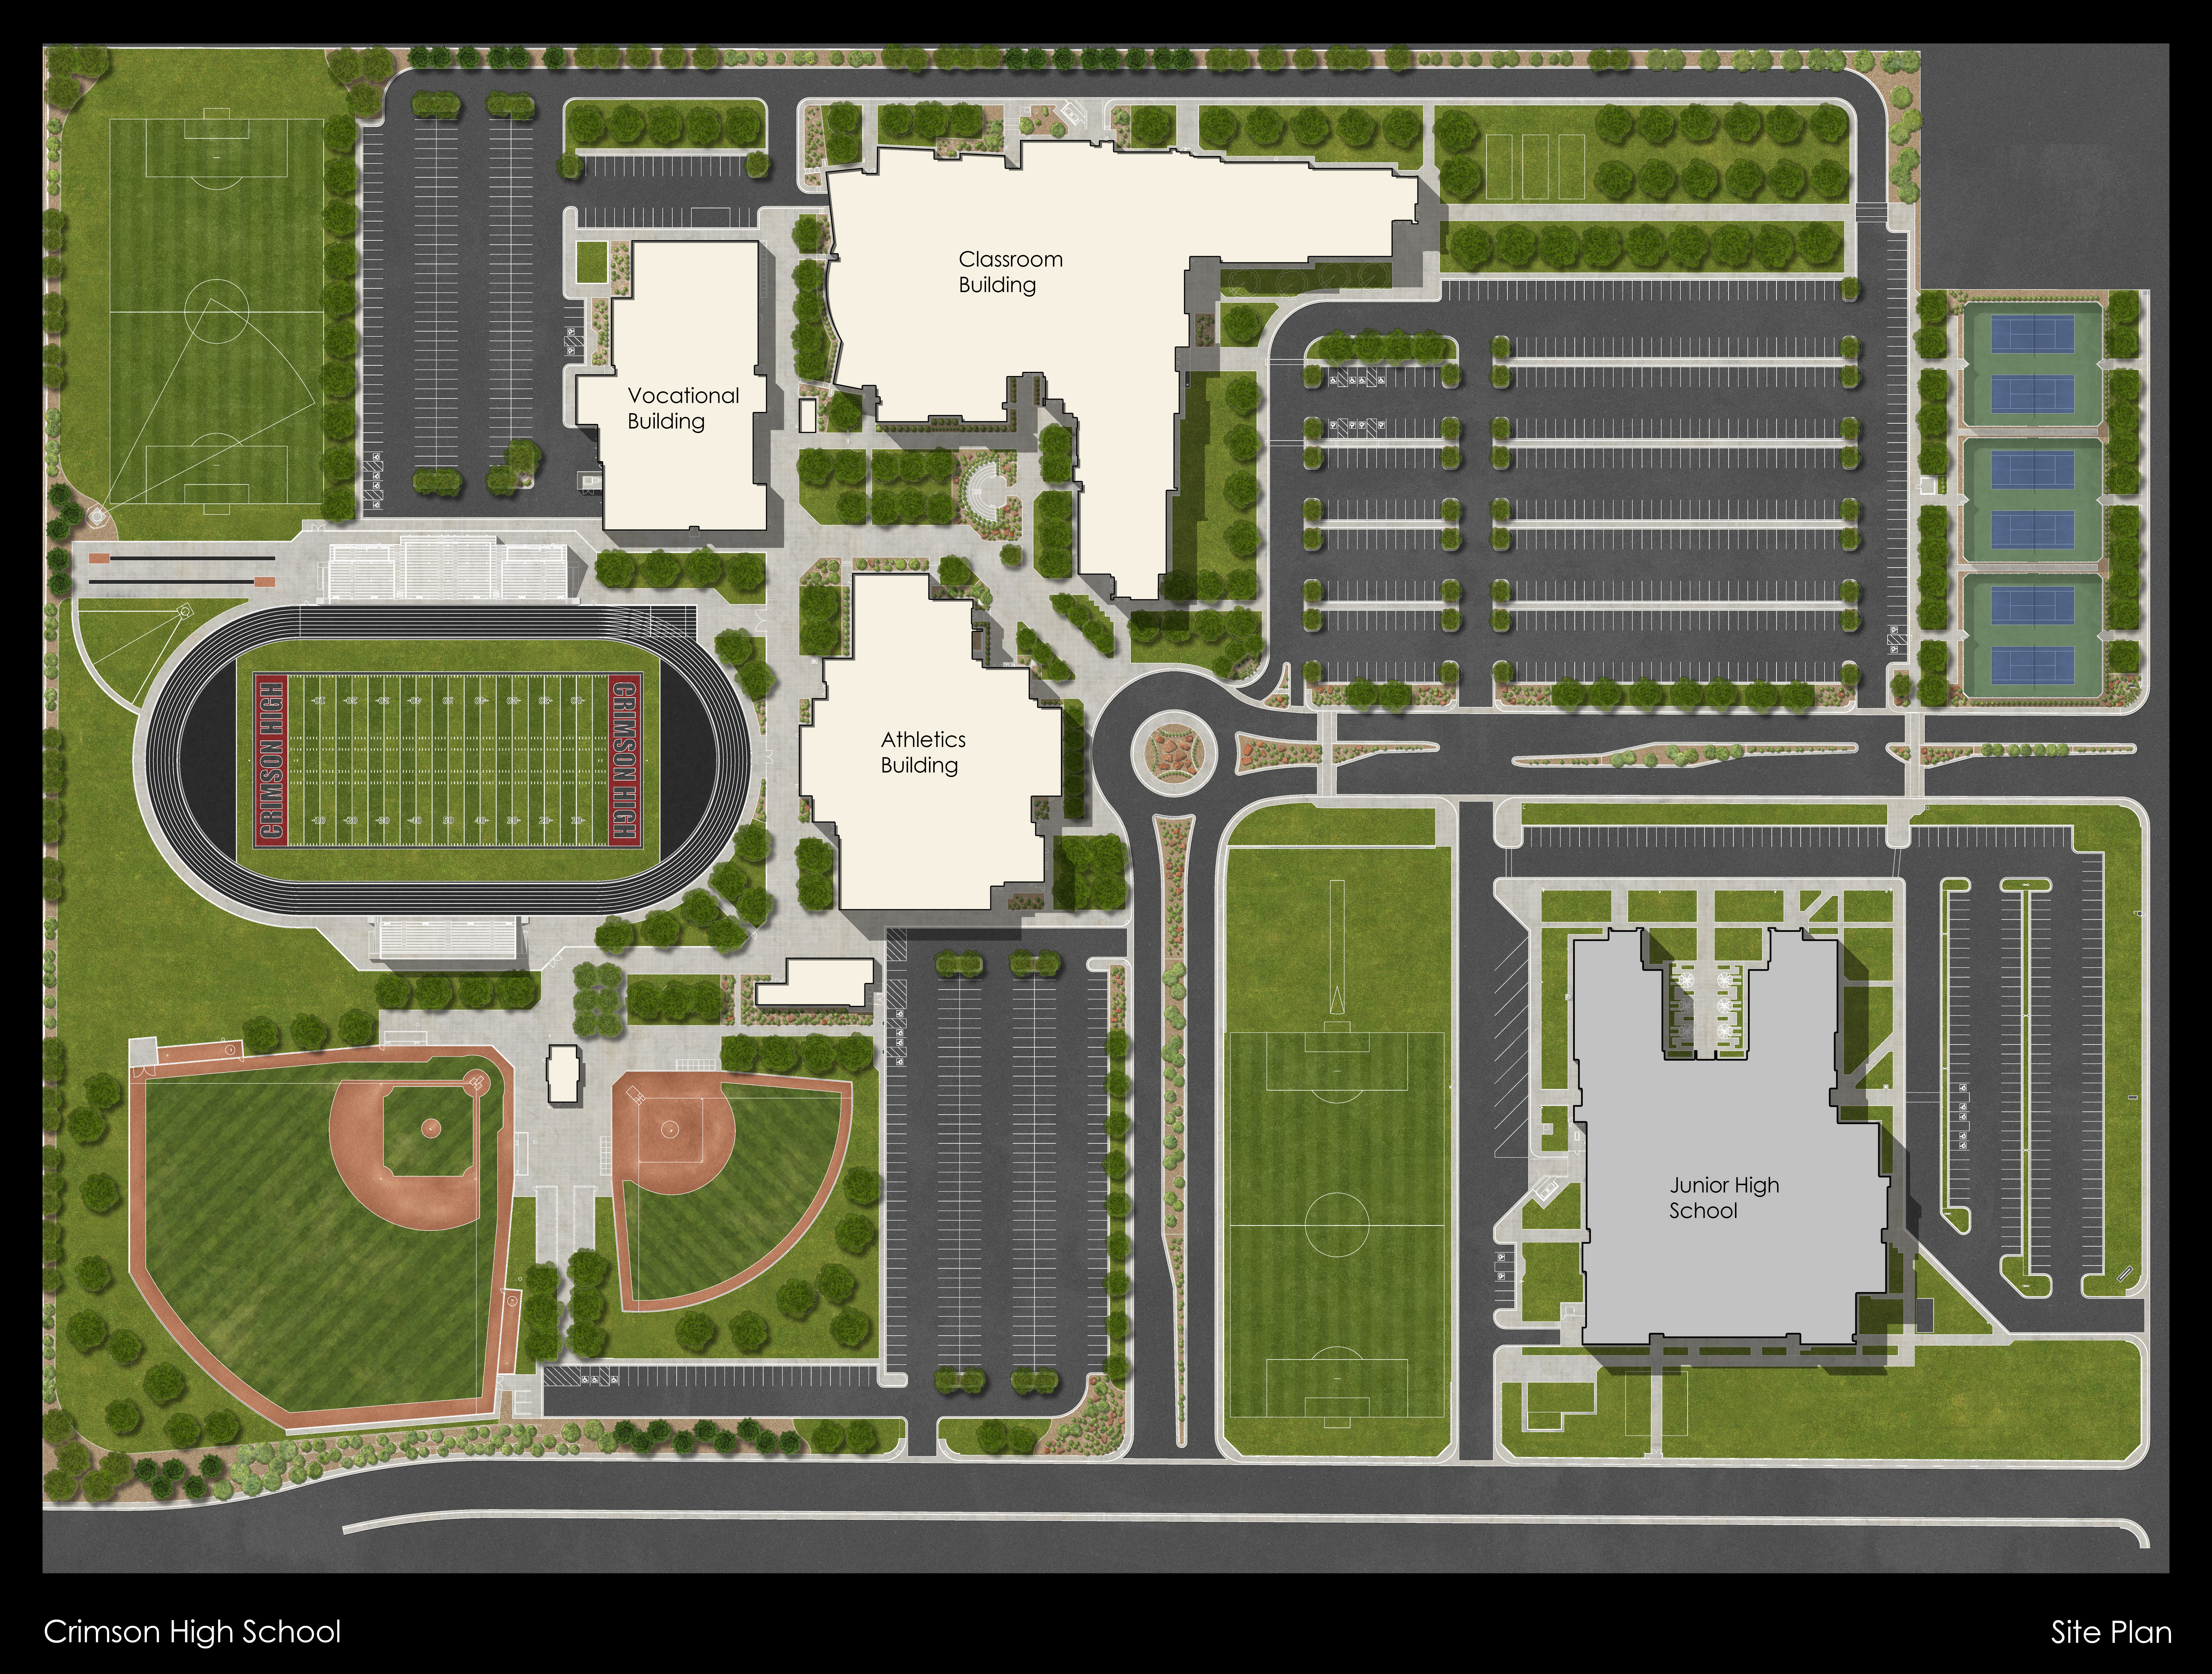 16.12.12 Crimson High Site Plan